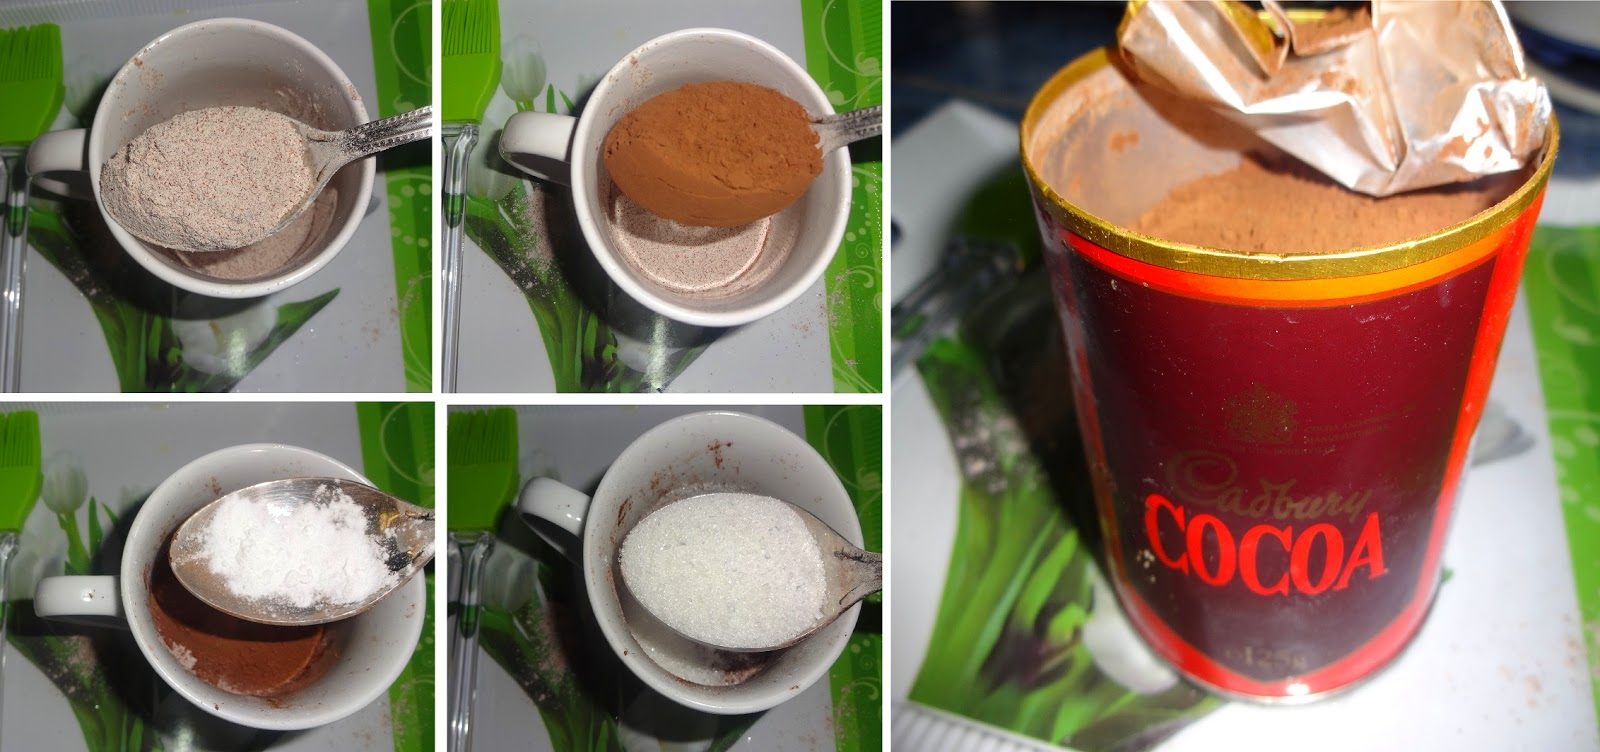 Mug Cake Recipe Without Baking Powder Or Baking Soda